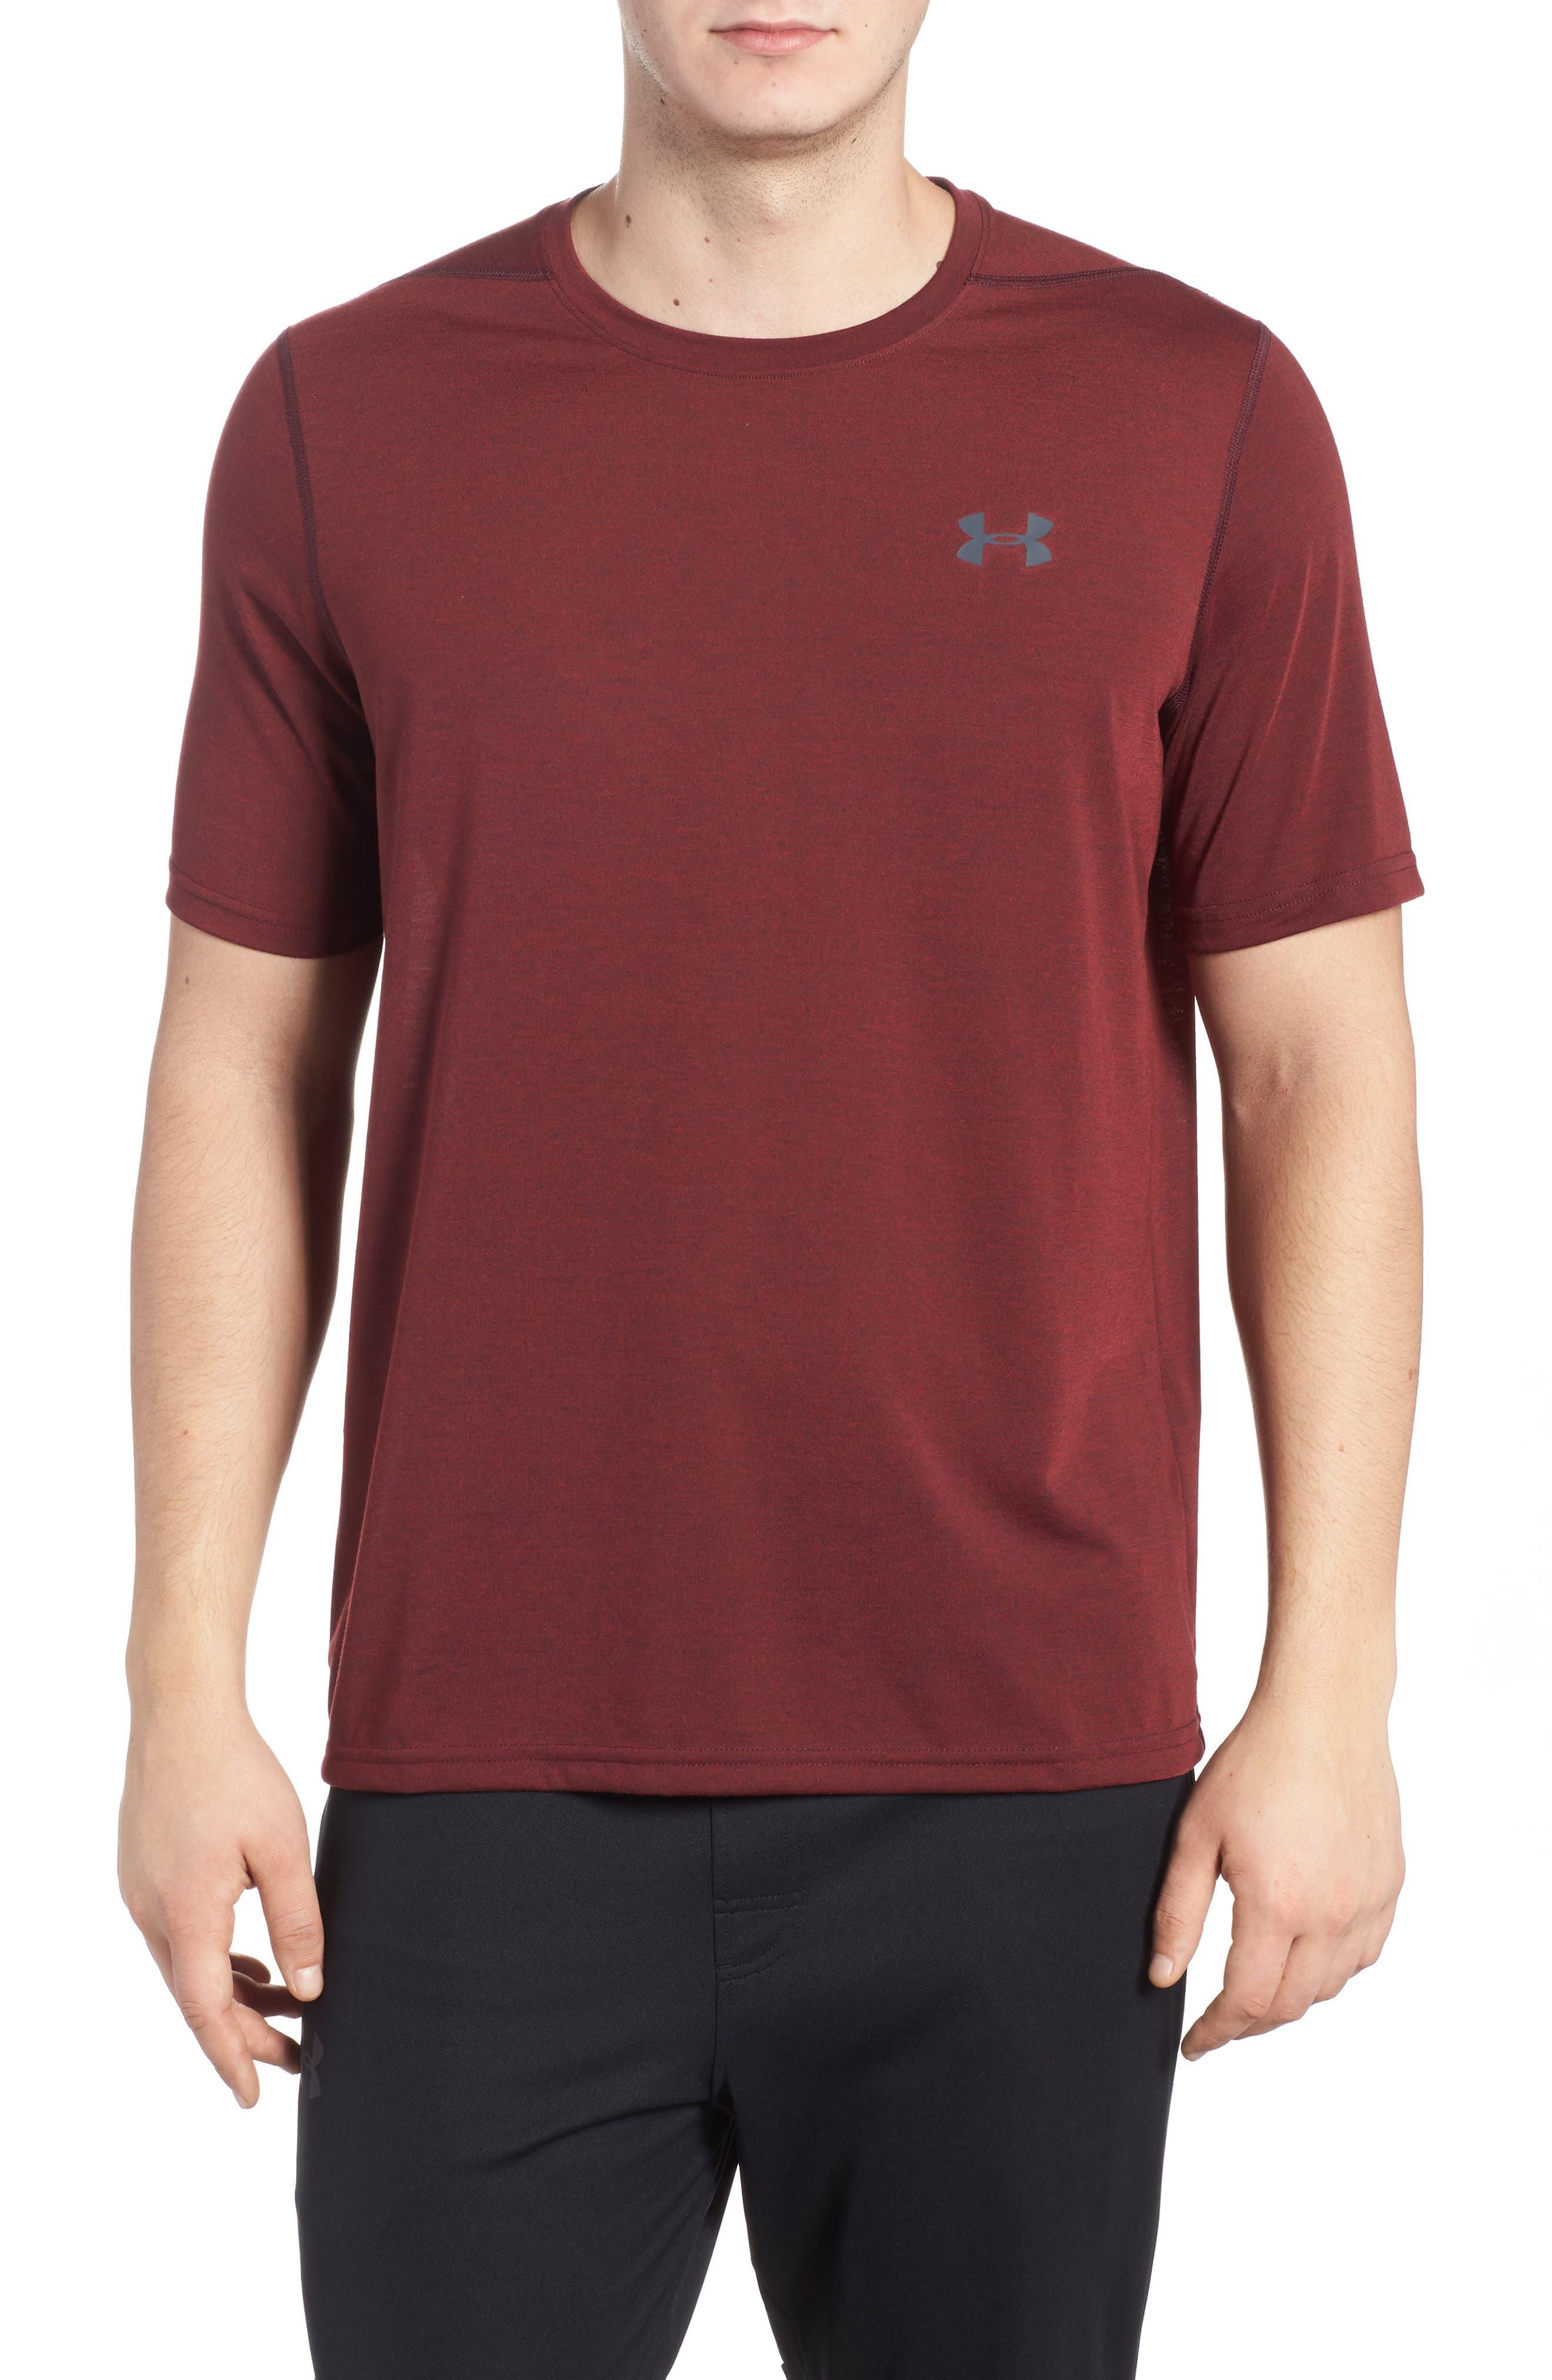 Alternate Image 1 Selected - Under Armour Threadborne Siro 3C Twist T-Shirt